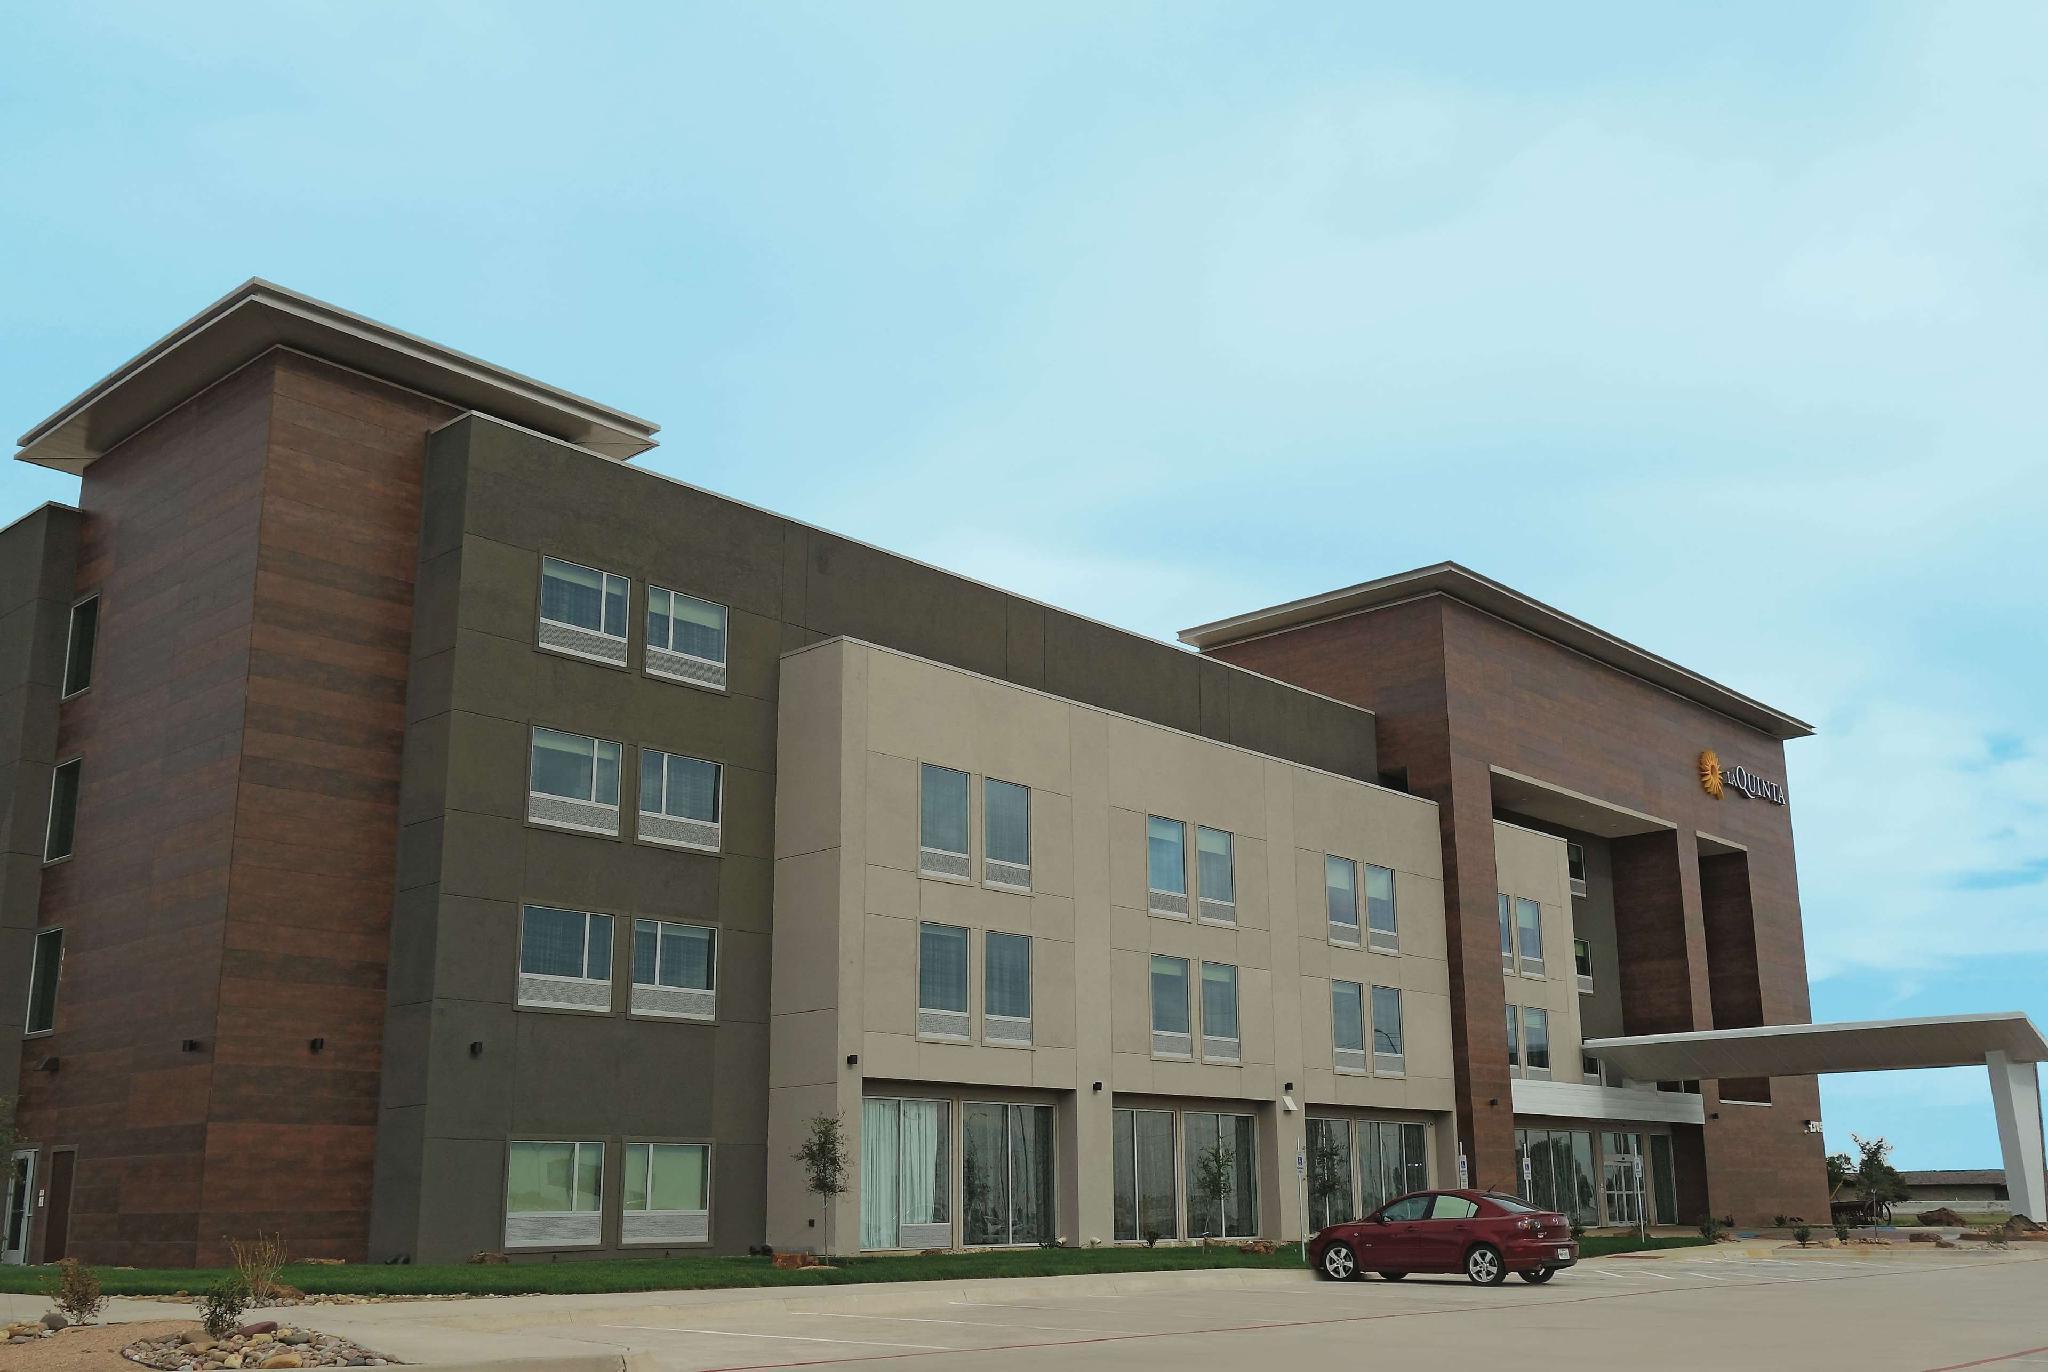 La Quinta Inn And Suites By Wyndham Amarillo Airport